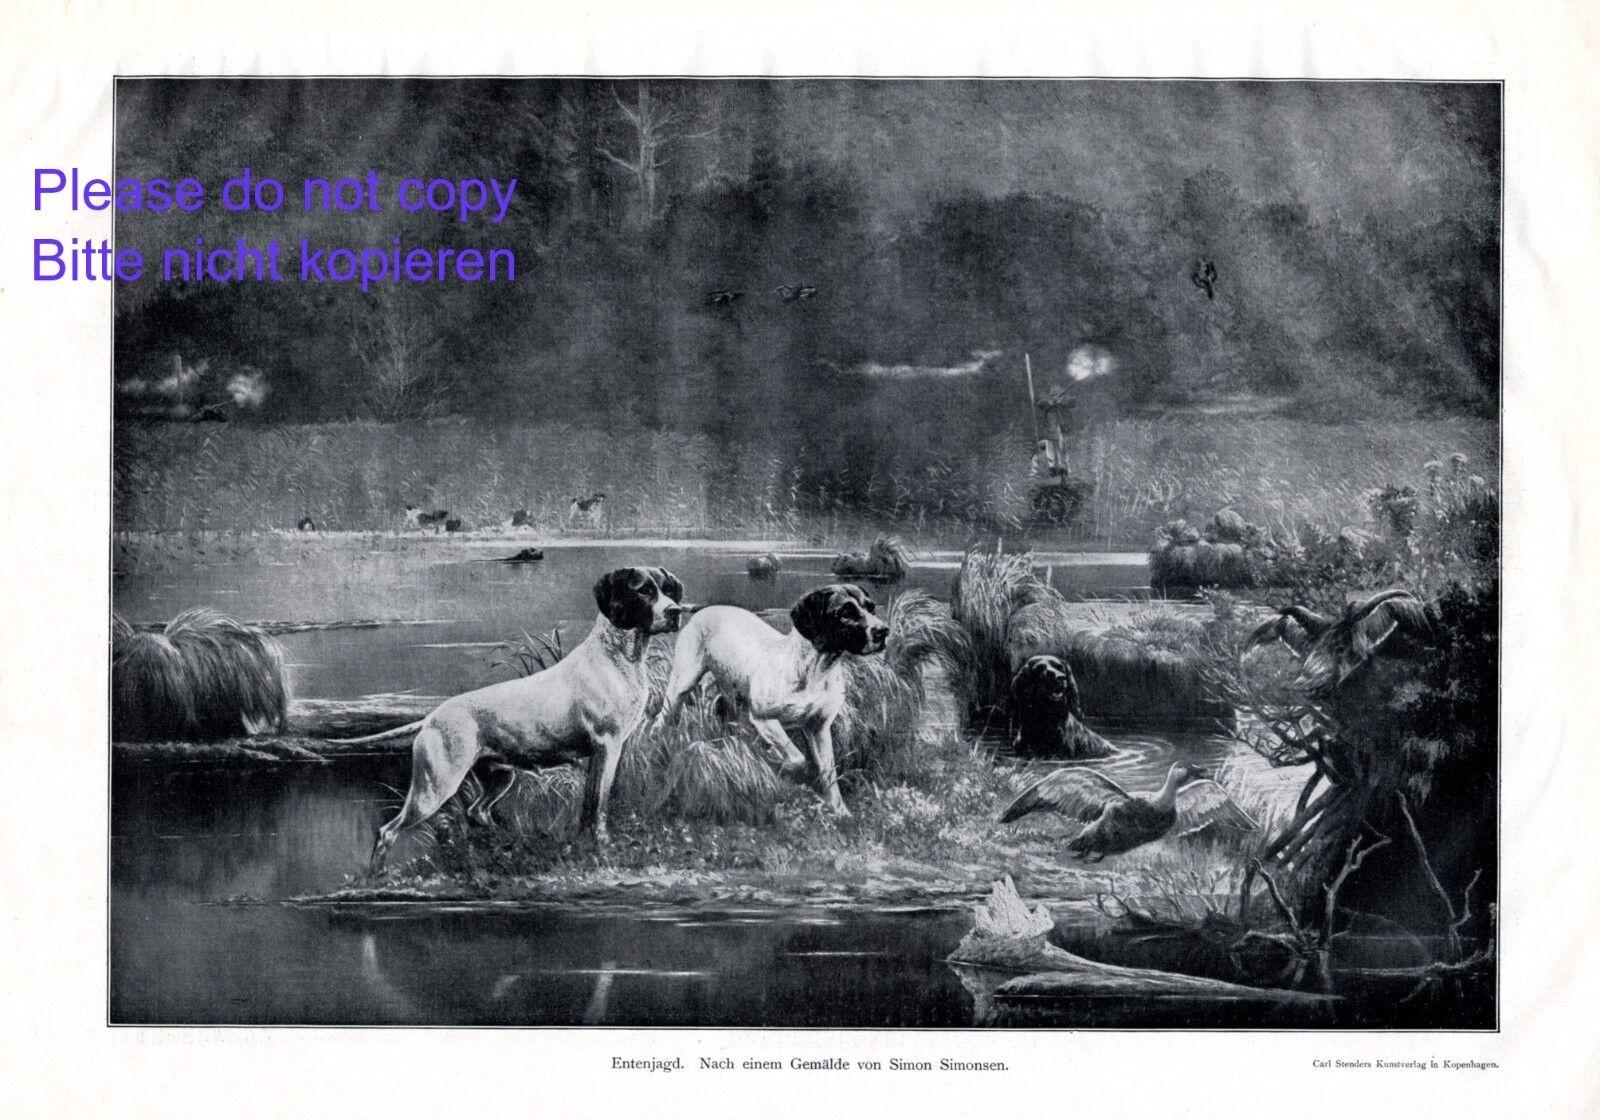 Die Entenjagd XL Kunstdruck 1910 Simon Simonsen Jagdhund Jäger Schuß Weiher Ente